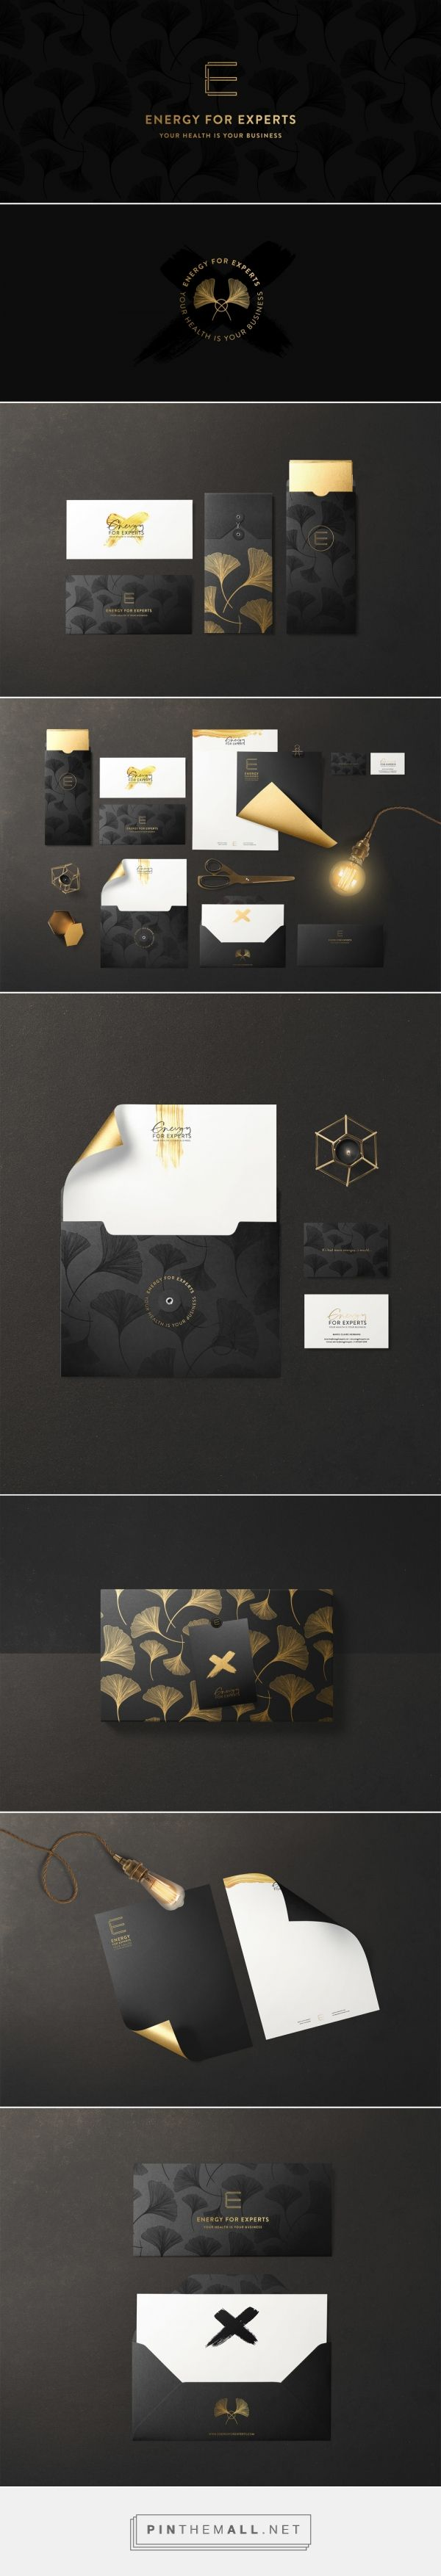 Energy for Experts Branding By Cocorrina | Fivestar Branding – Design and Branding Agency & Inspiration Gallery